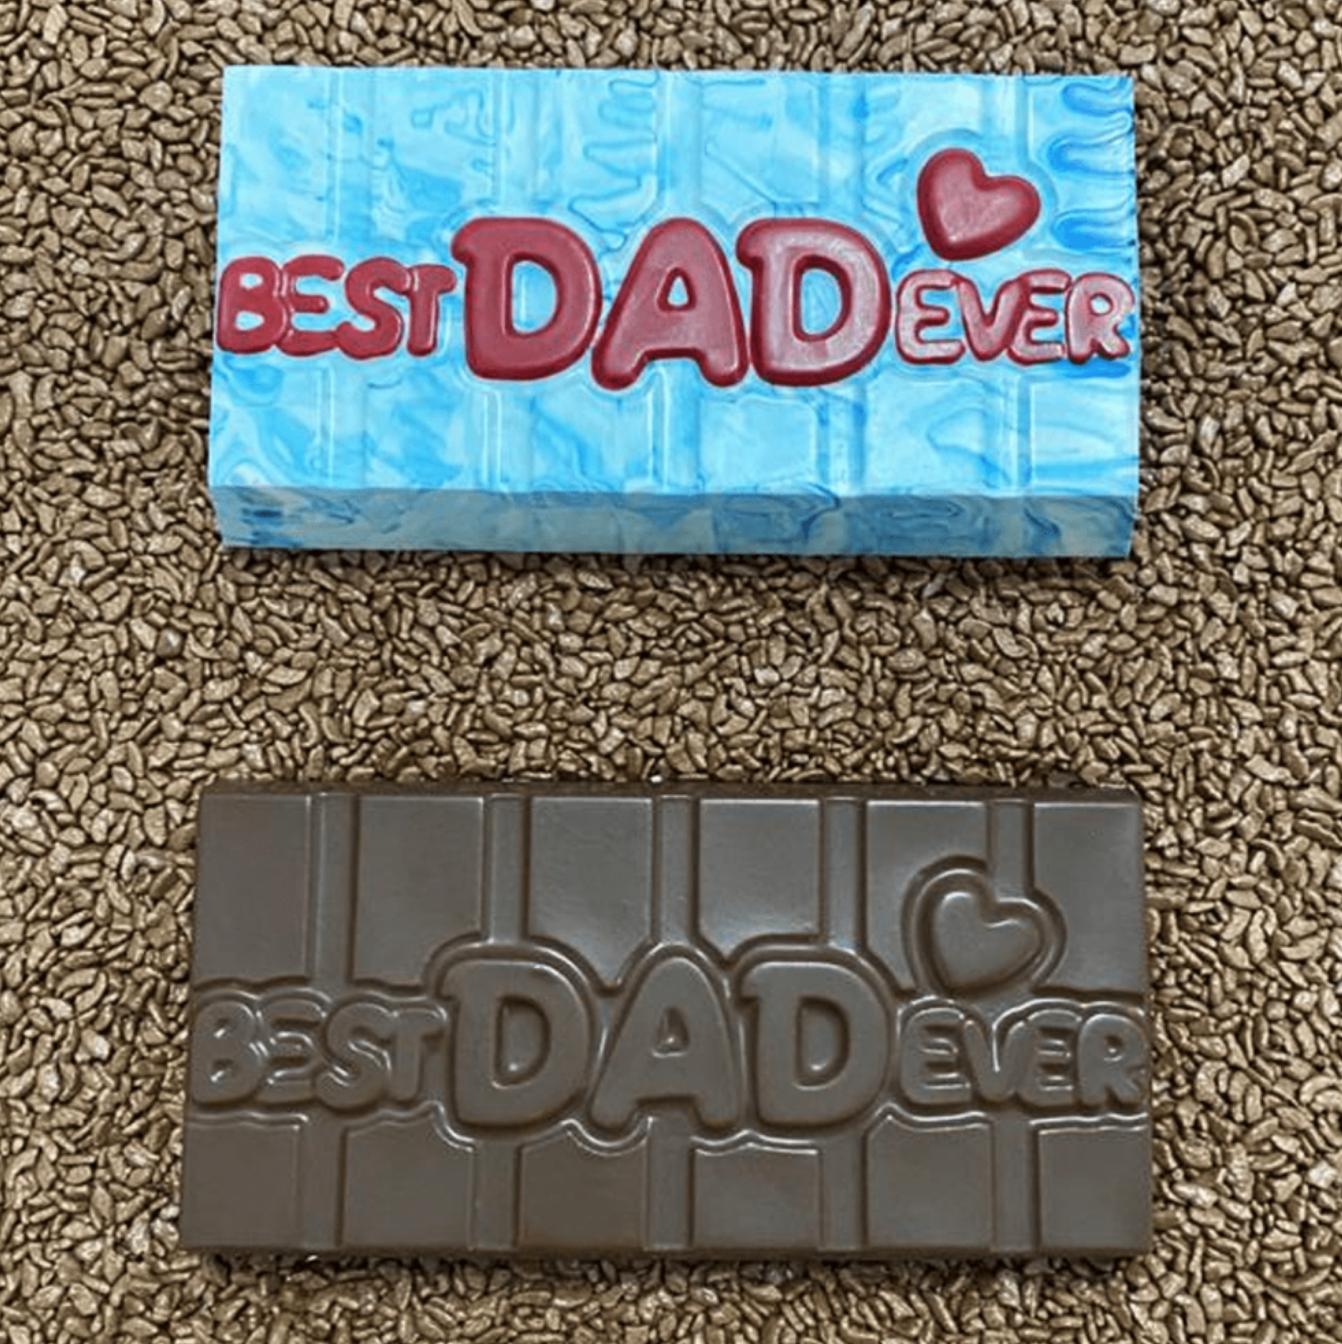 Best Dad Ever Tablet - 3 Part Mold - PRE-ORDER - Arriving end of January